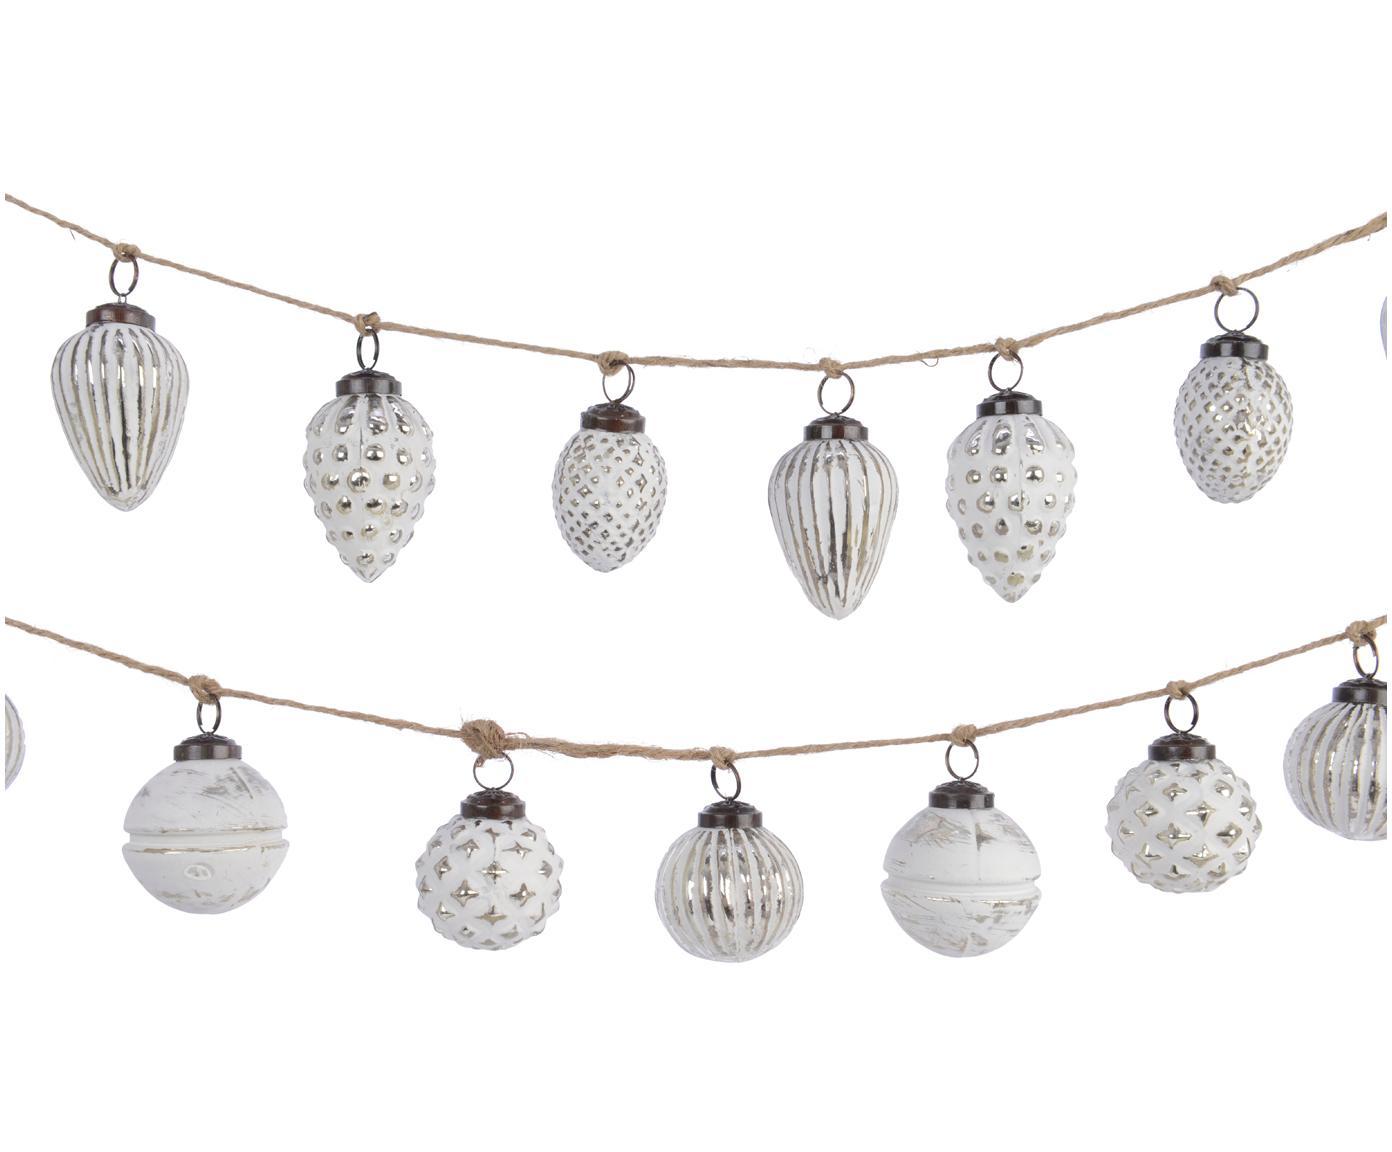 Set de guirnaldas navideñas Dil, 2pzas., Vaso, Blanco, L 120 cm